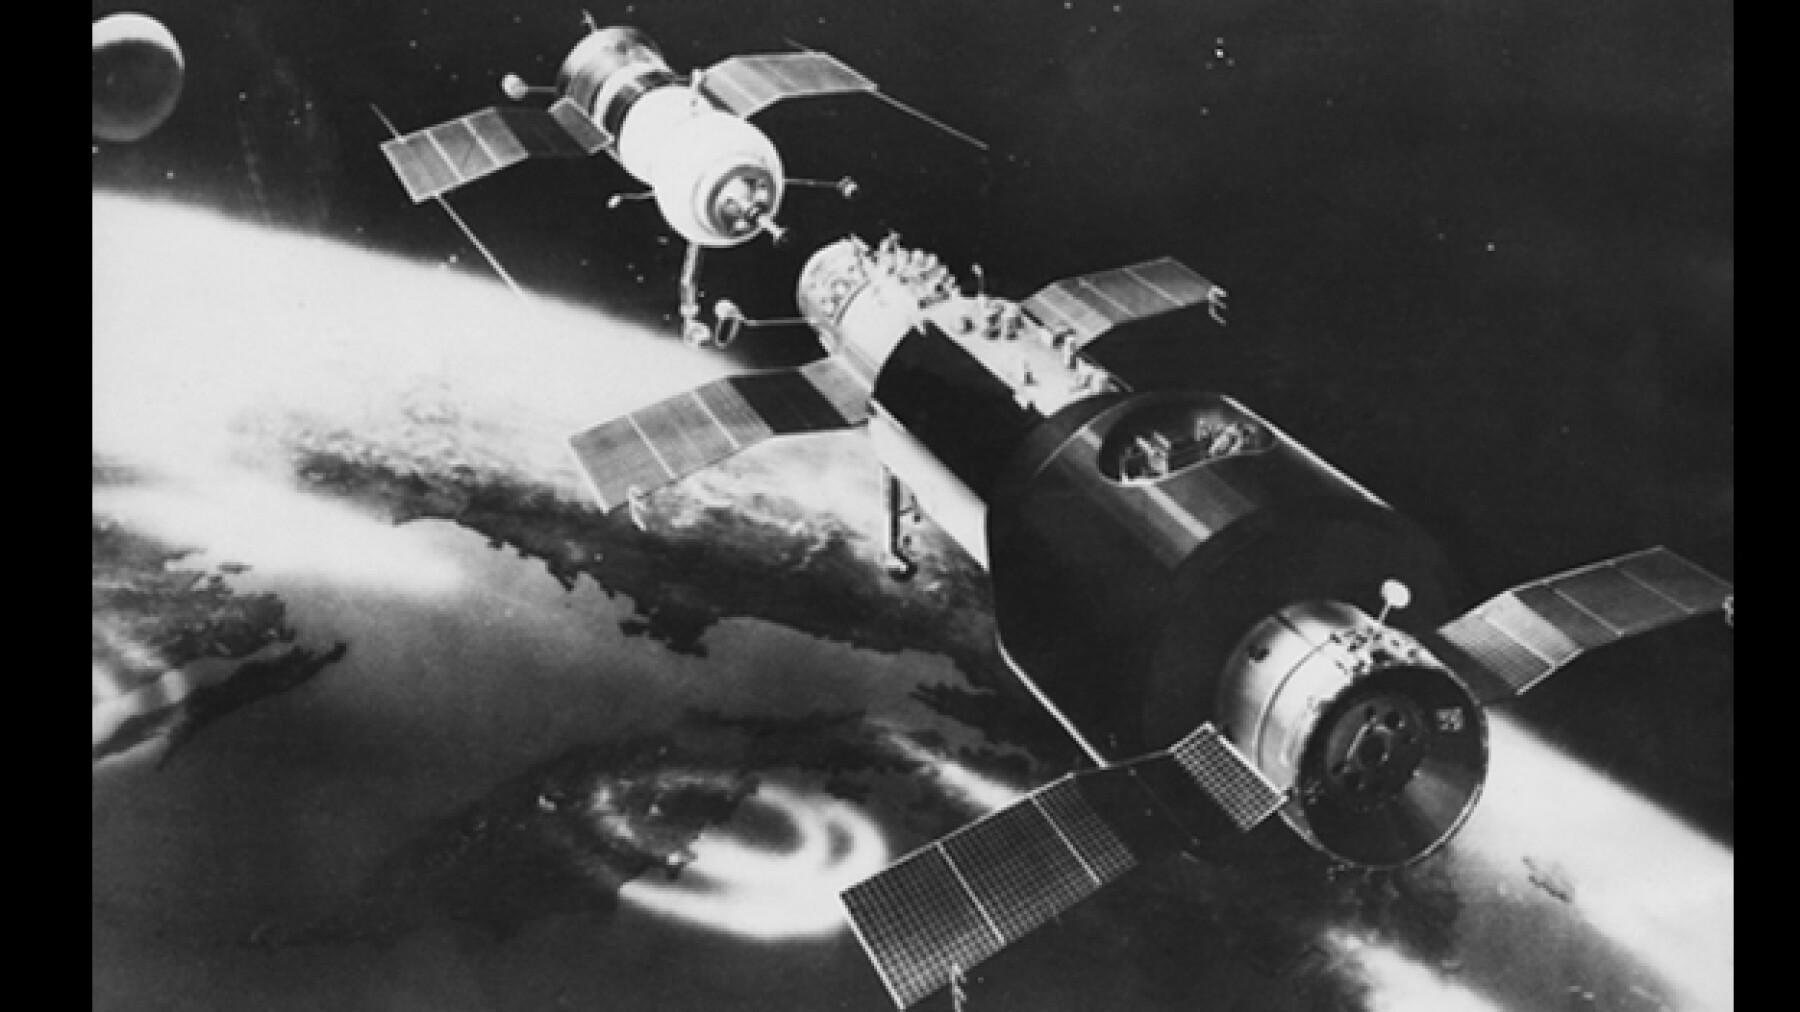 Soyouz 11 Salyut 1 primera estacion espacial